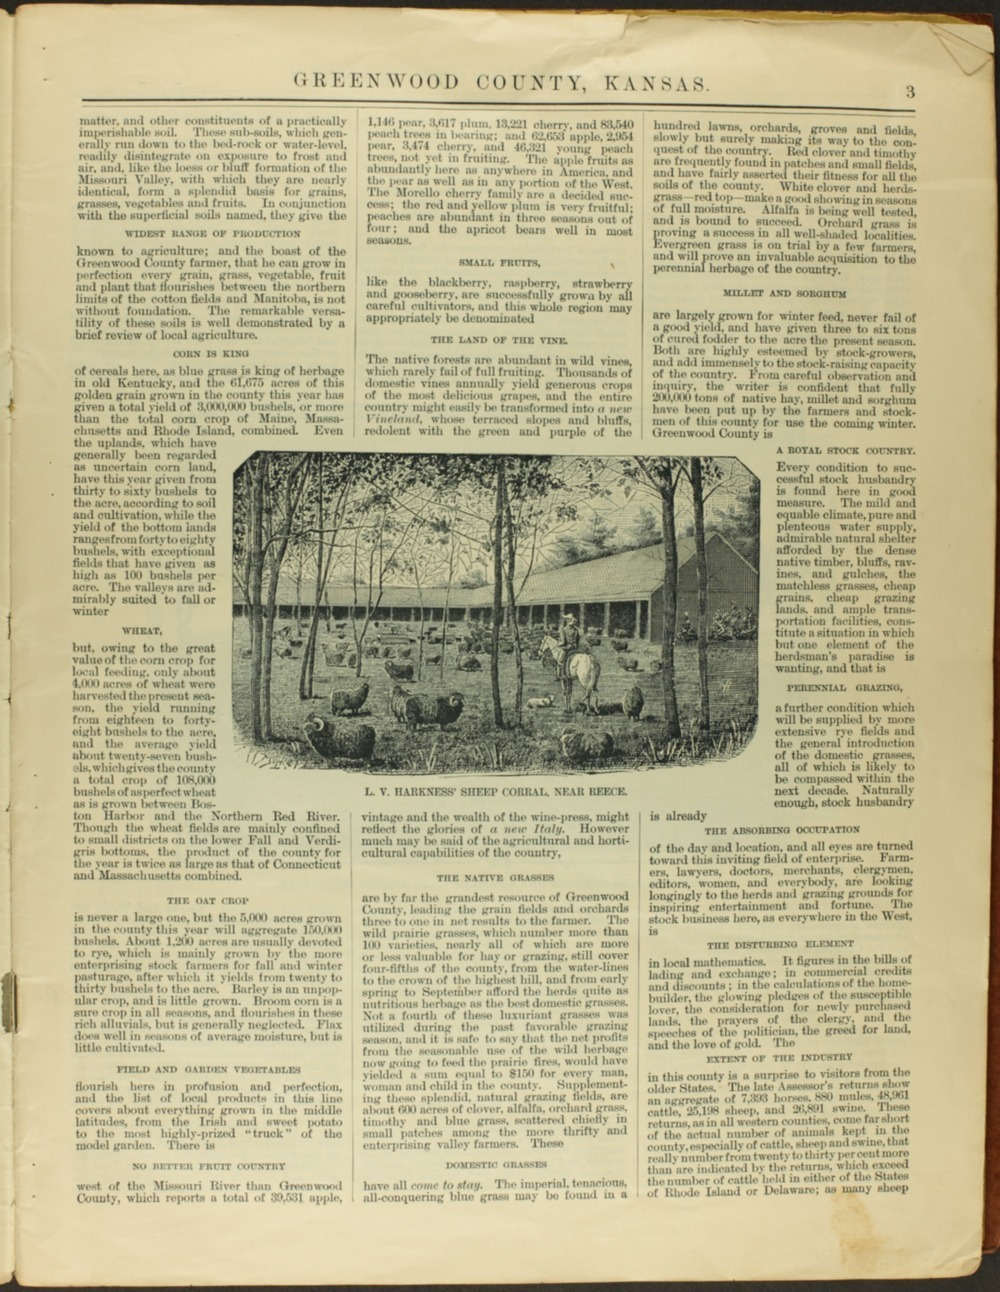 Handbook of Greenwood County, Kansas - 3